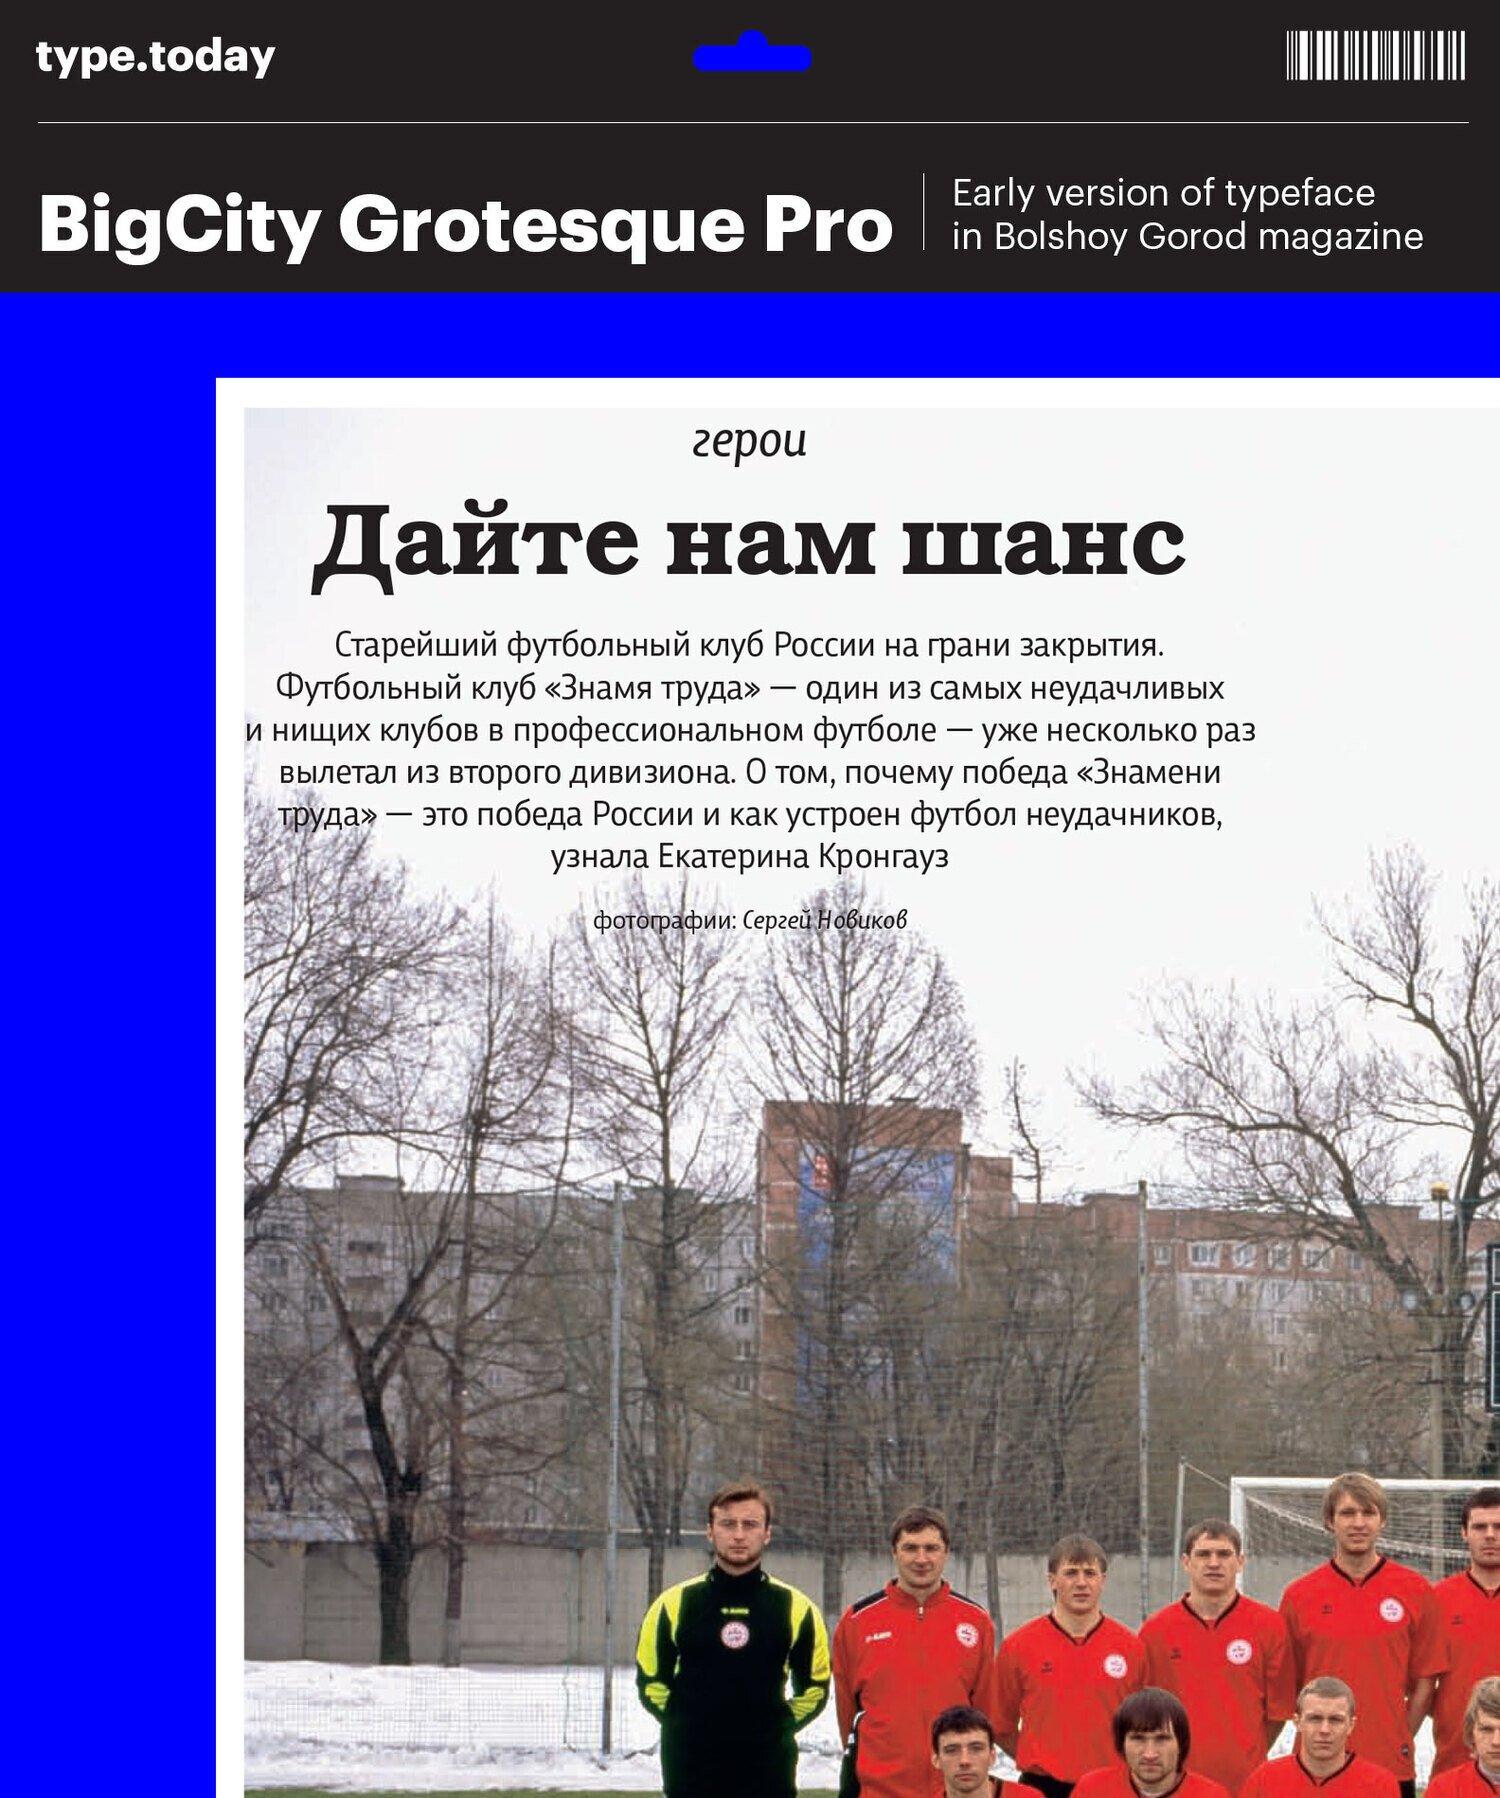 TT_BigCity_BG_4